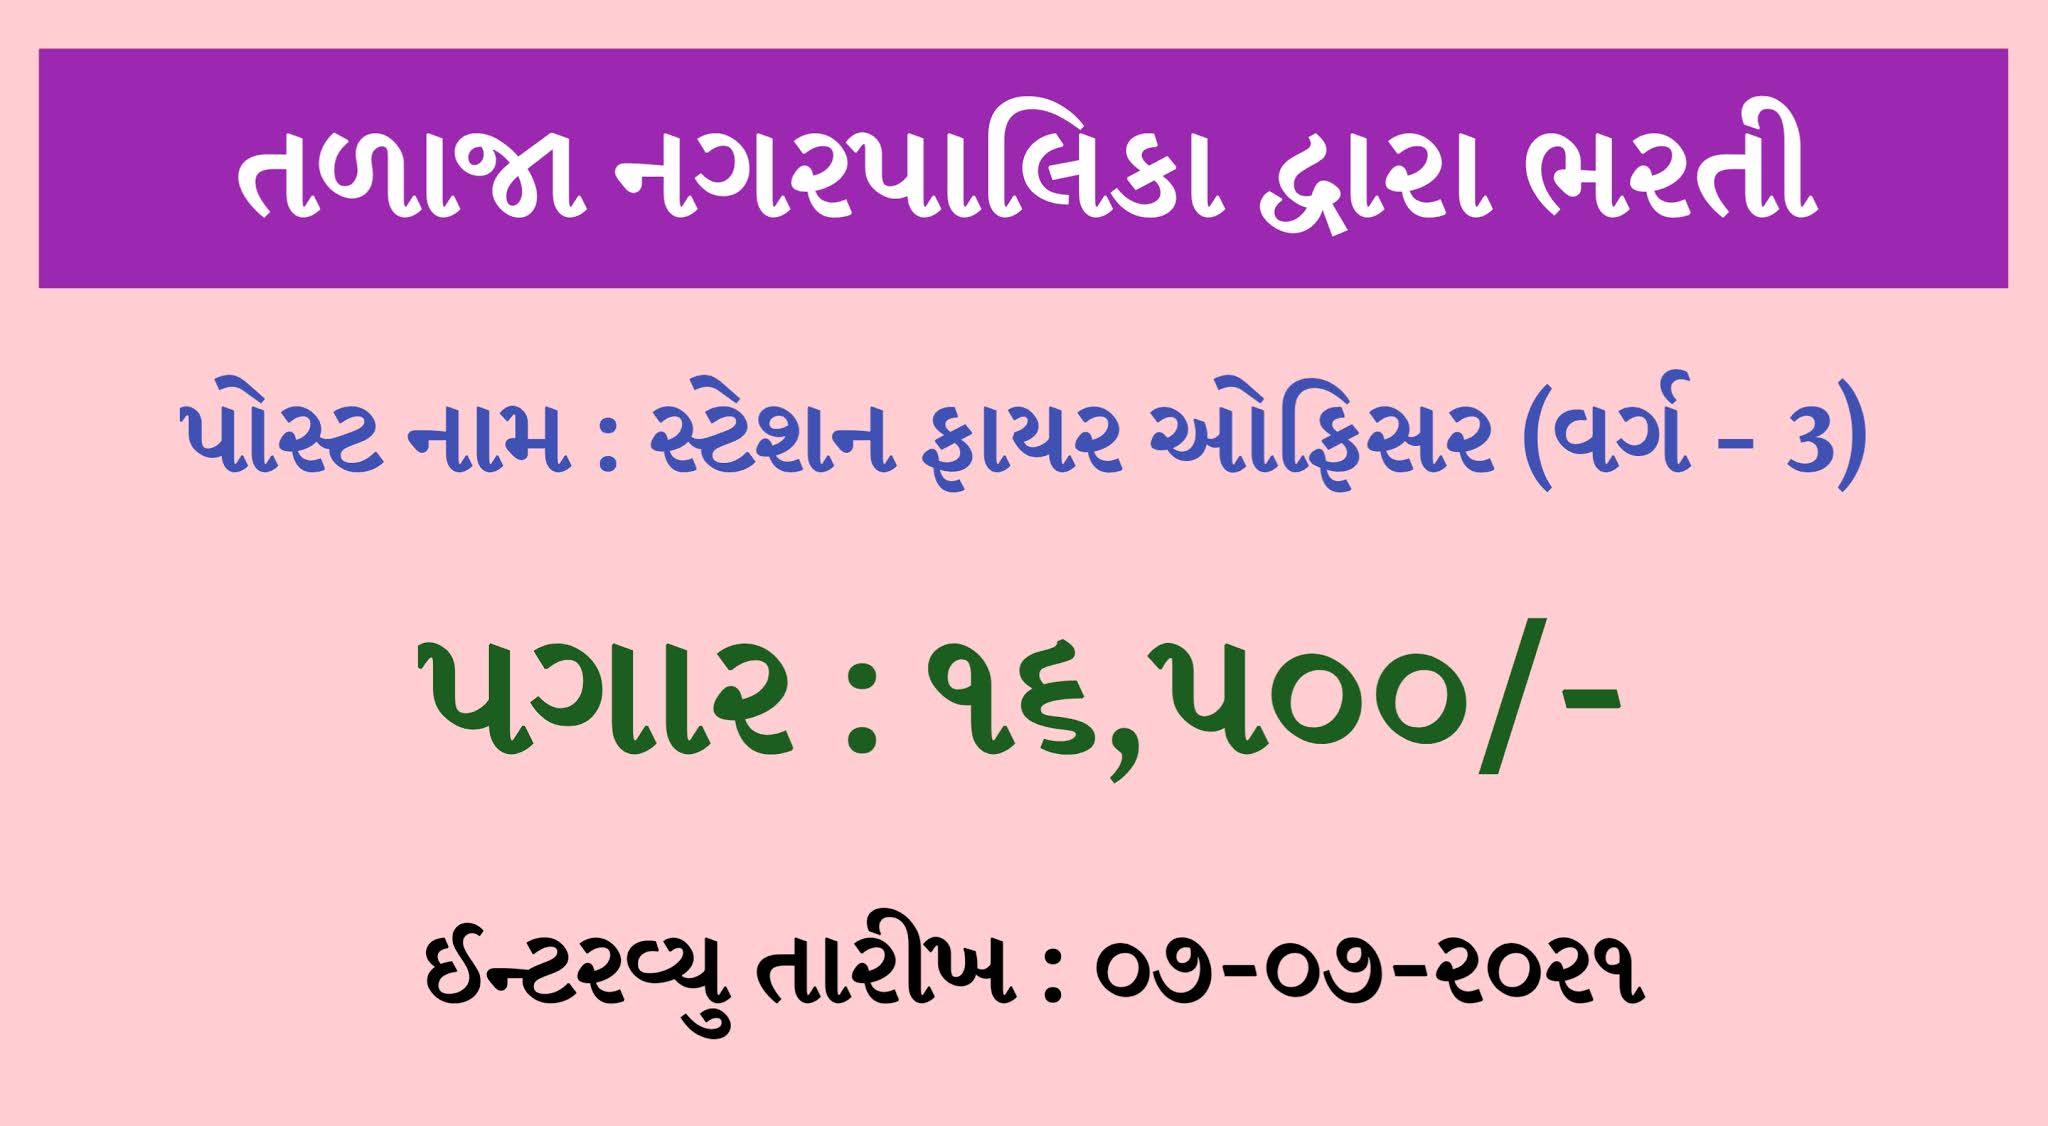 Talaja Nagarpalika Recruitment 2021,Station Fire Officer Recruitment 2021,Talaja Nagarpalika Recruitment Fire Officer post 2021